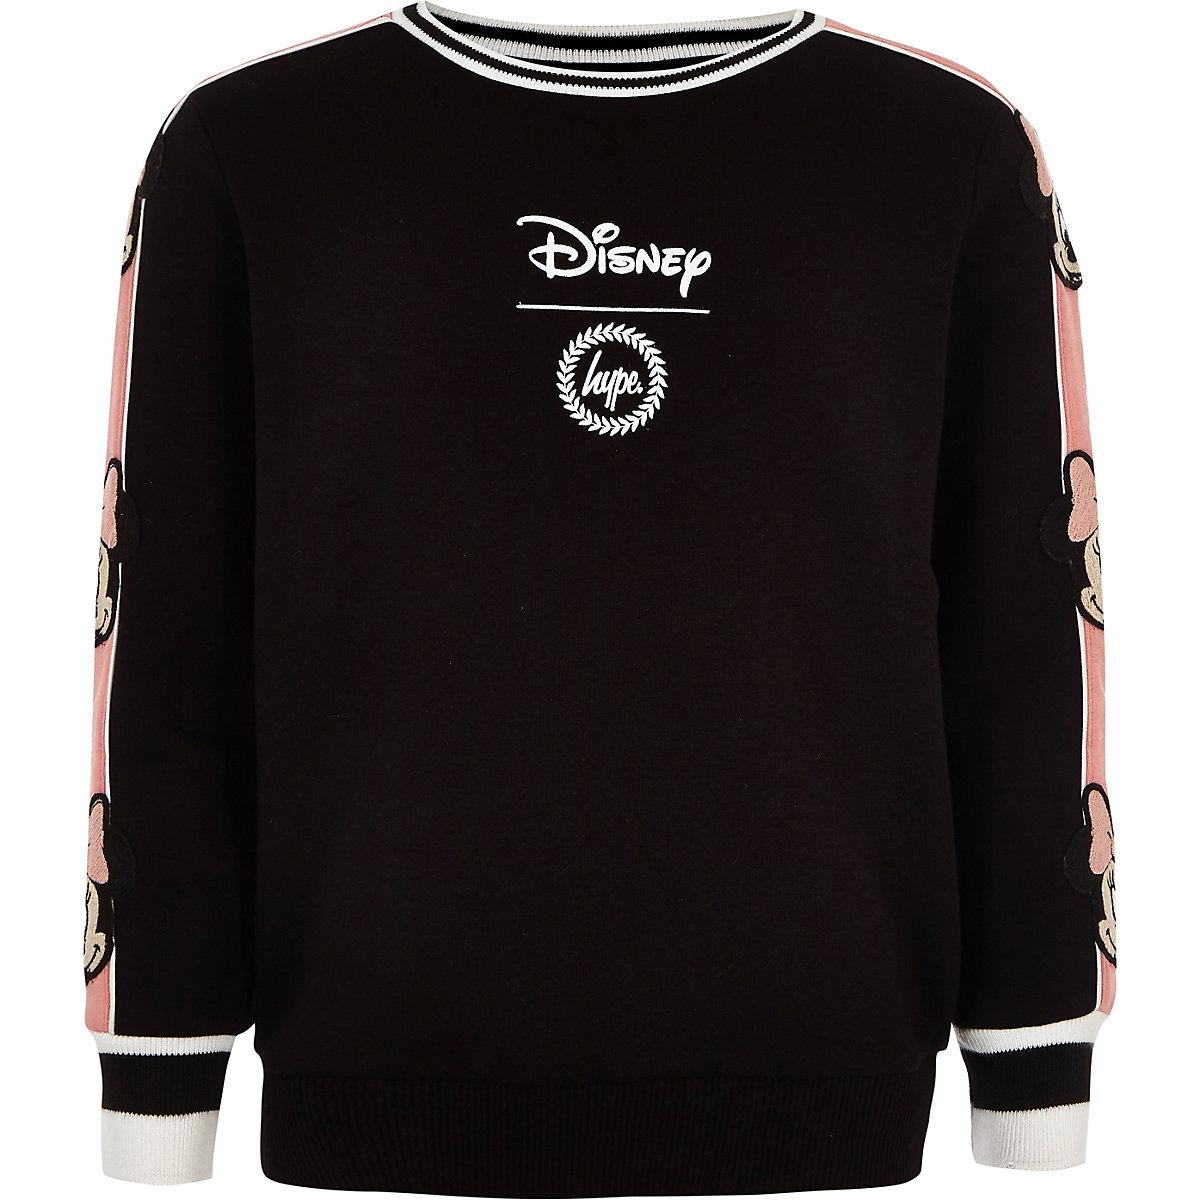 Girls black Hype Disney sweatshirt